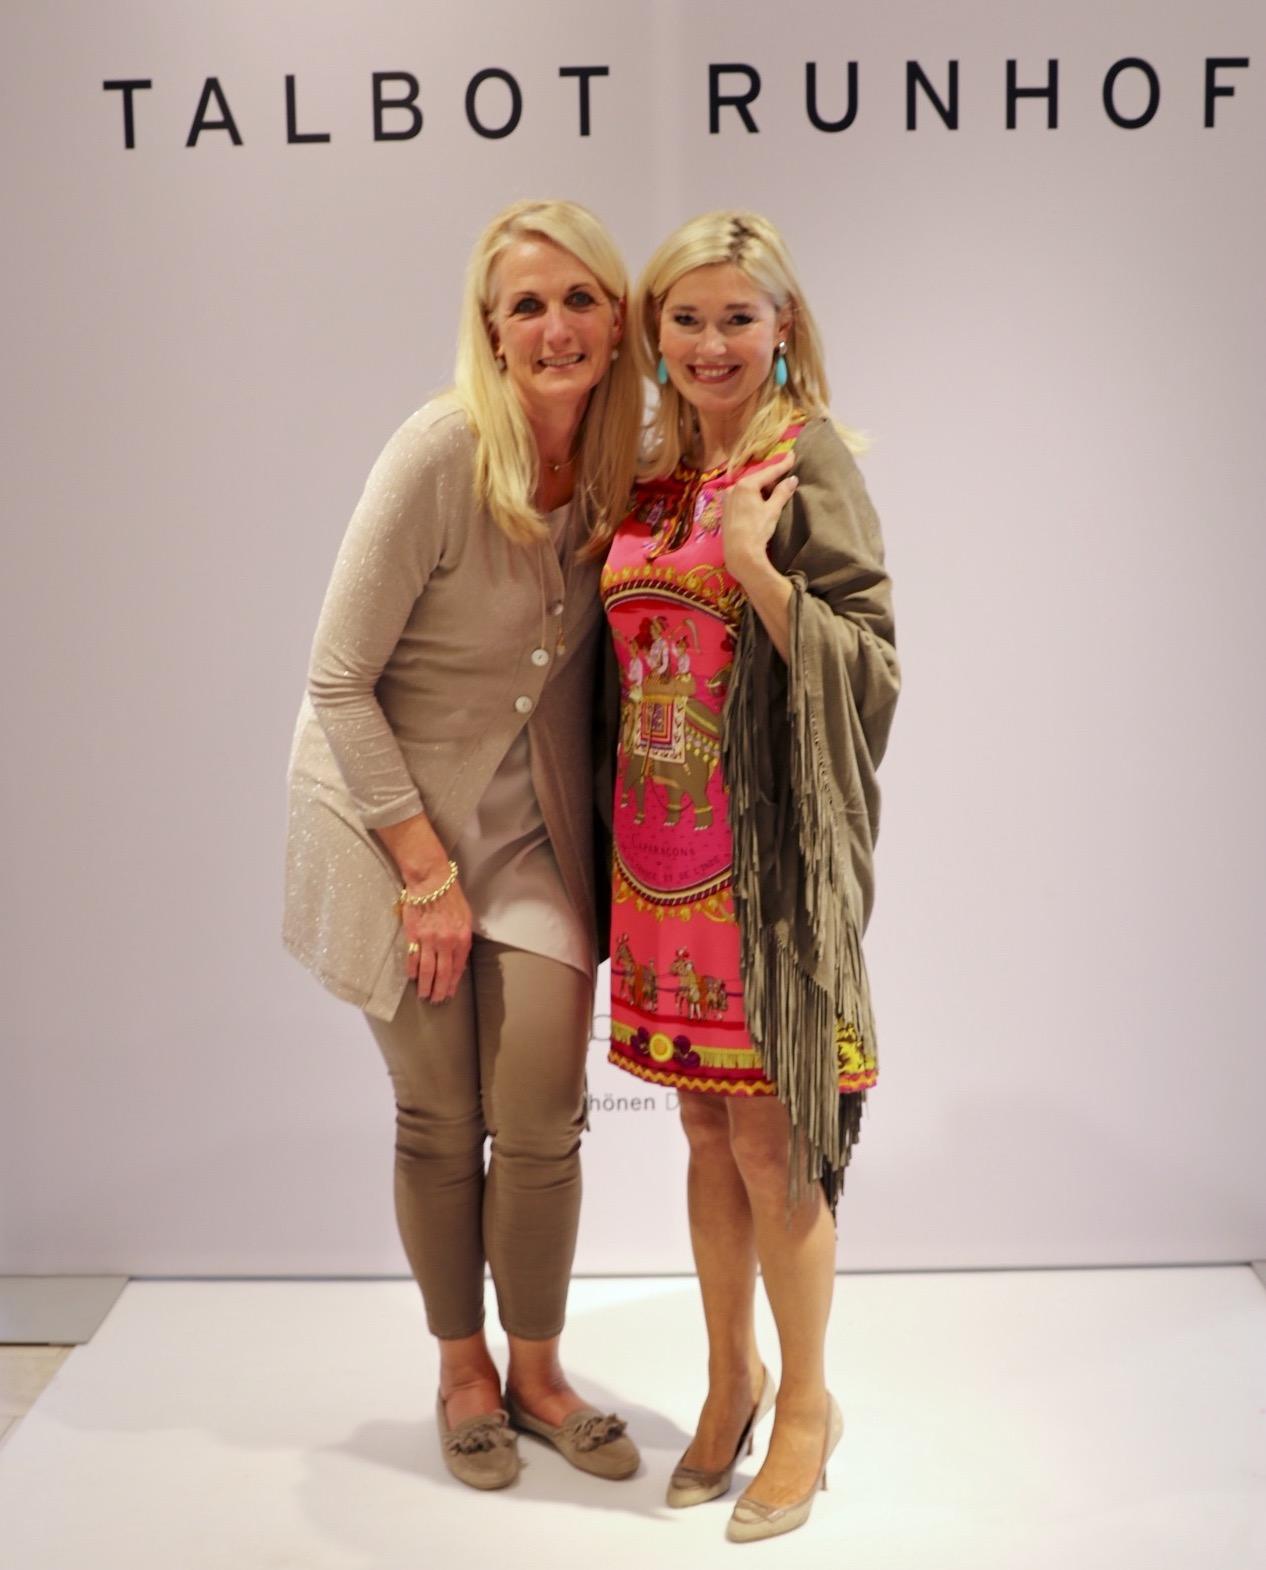 Cornelia Dinand-Pauli, Petra Dieners, Talbot Runhof Modenschau bei Breuninger, Fashion-Blog, Lieblingsstil.com,